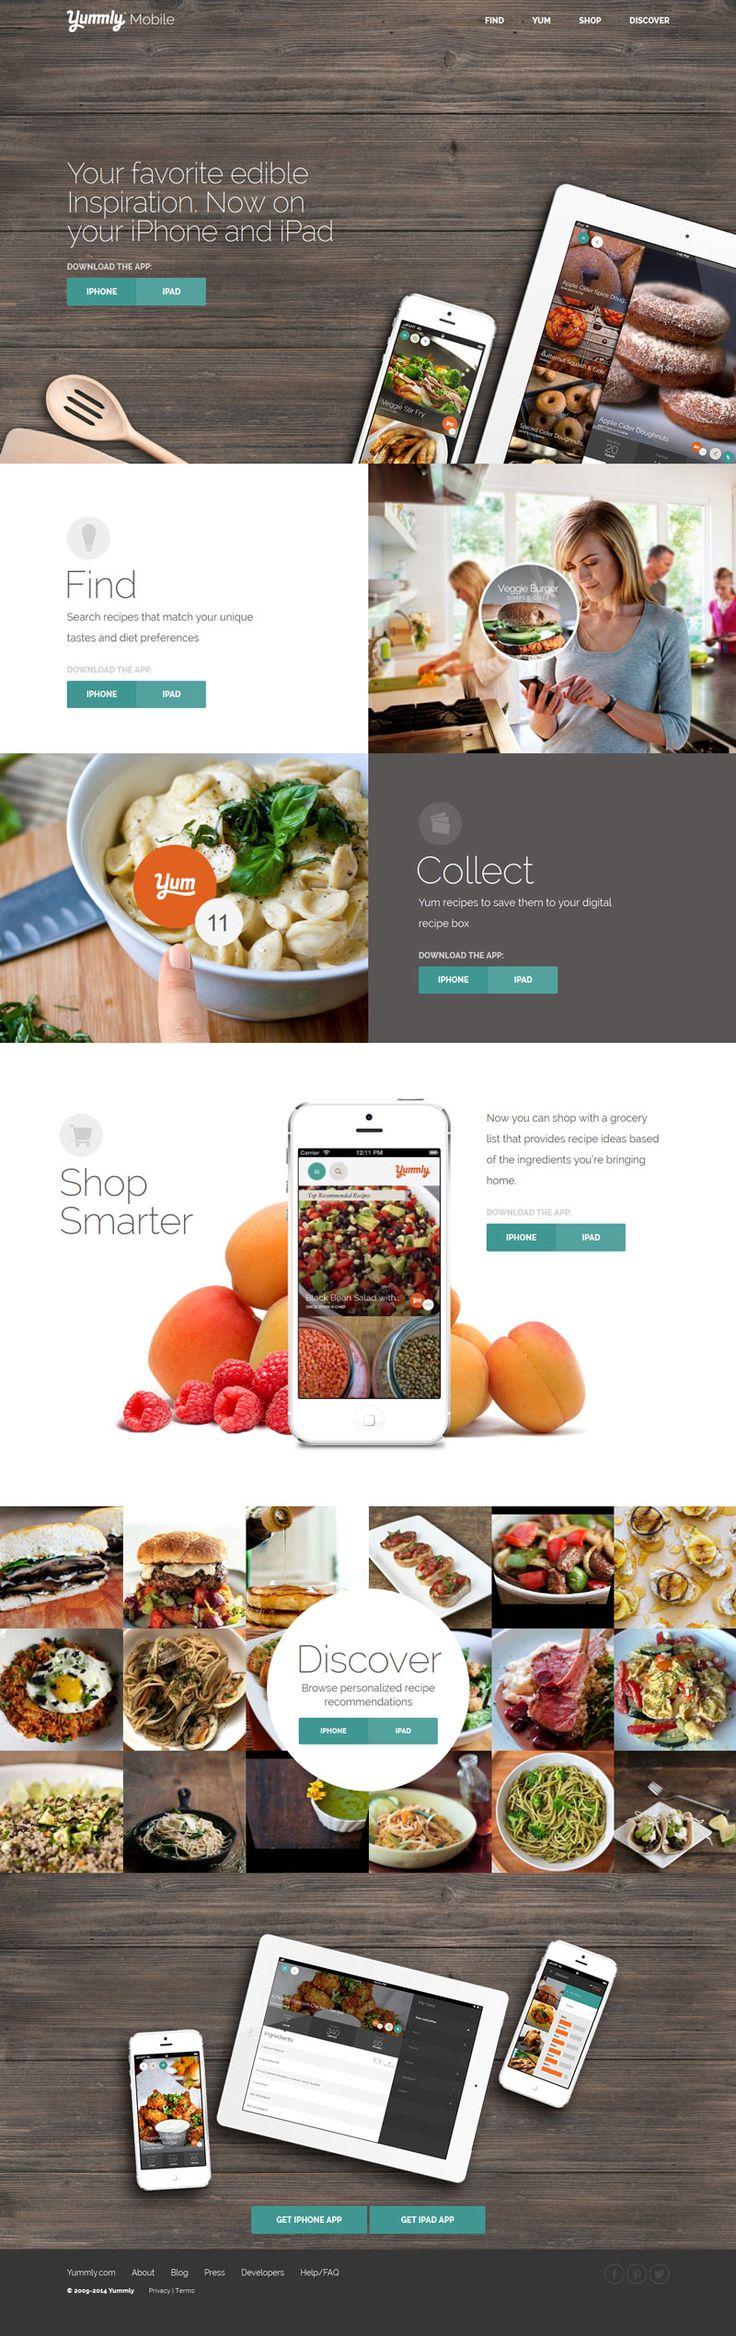 Yumml Mobile, flat design website, wood  #webdesjgn #UI#UX